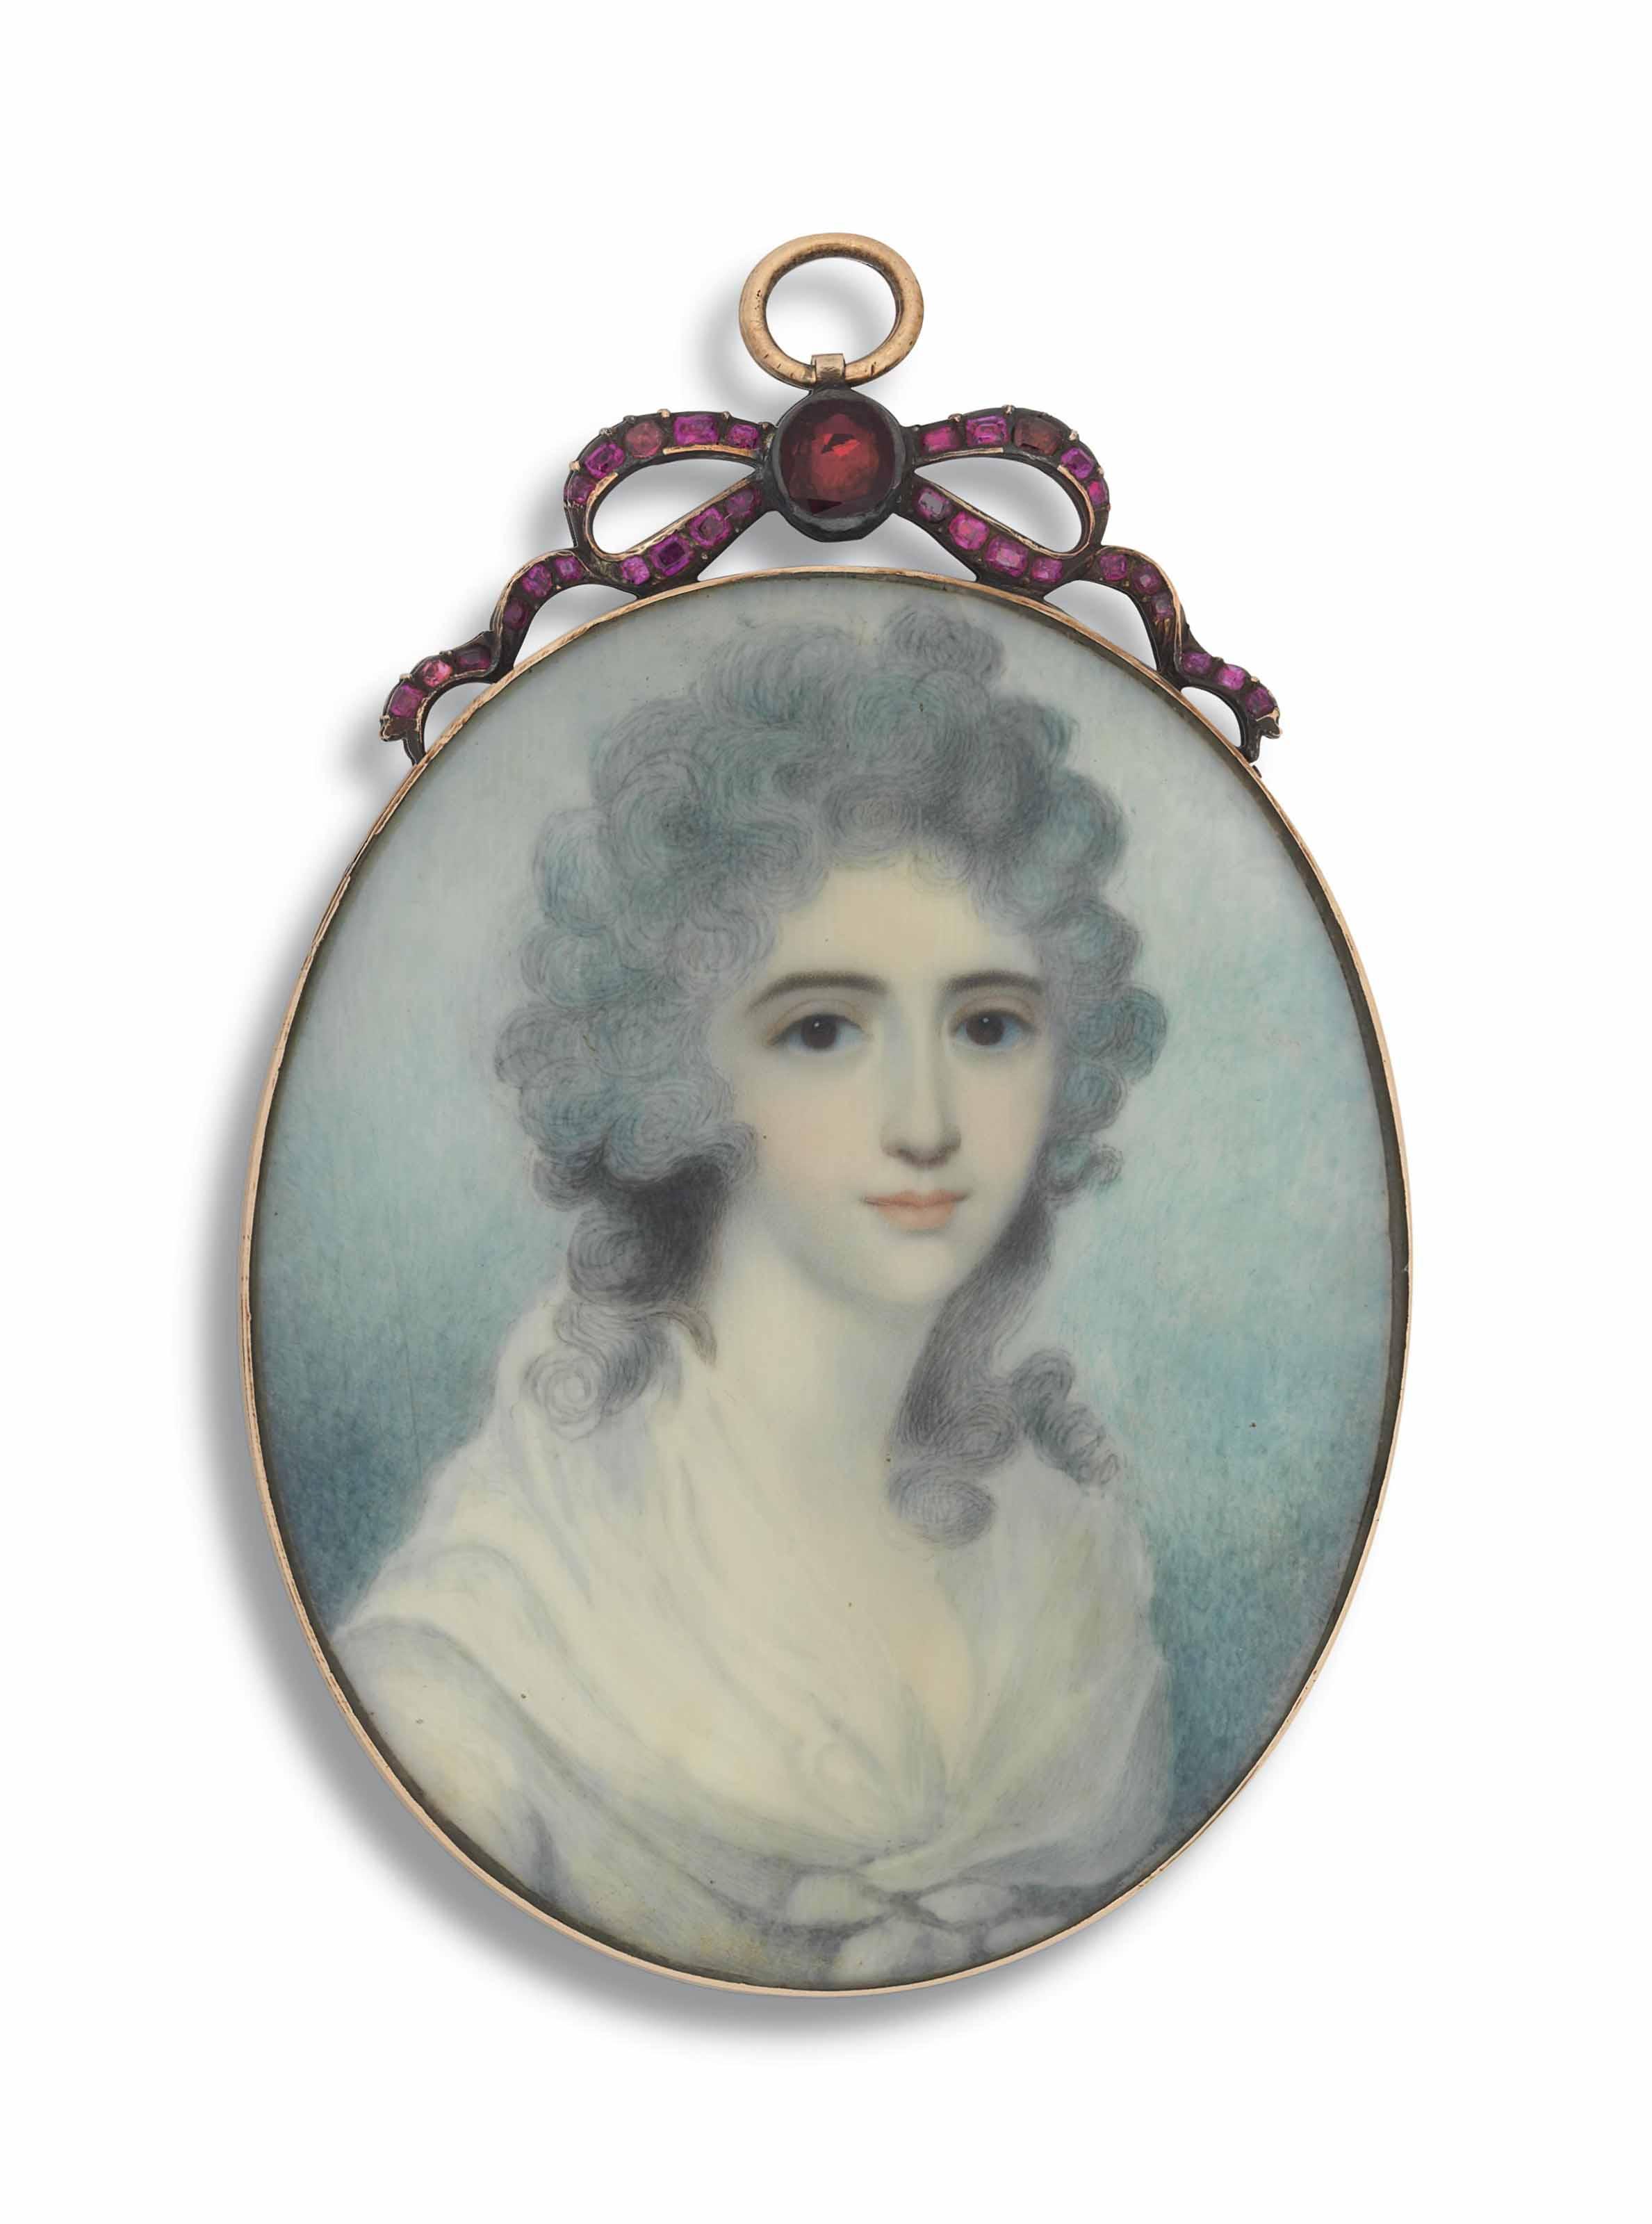 JOHN DONALDSON (SCOTTISH, 1737